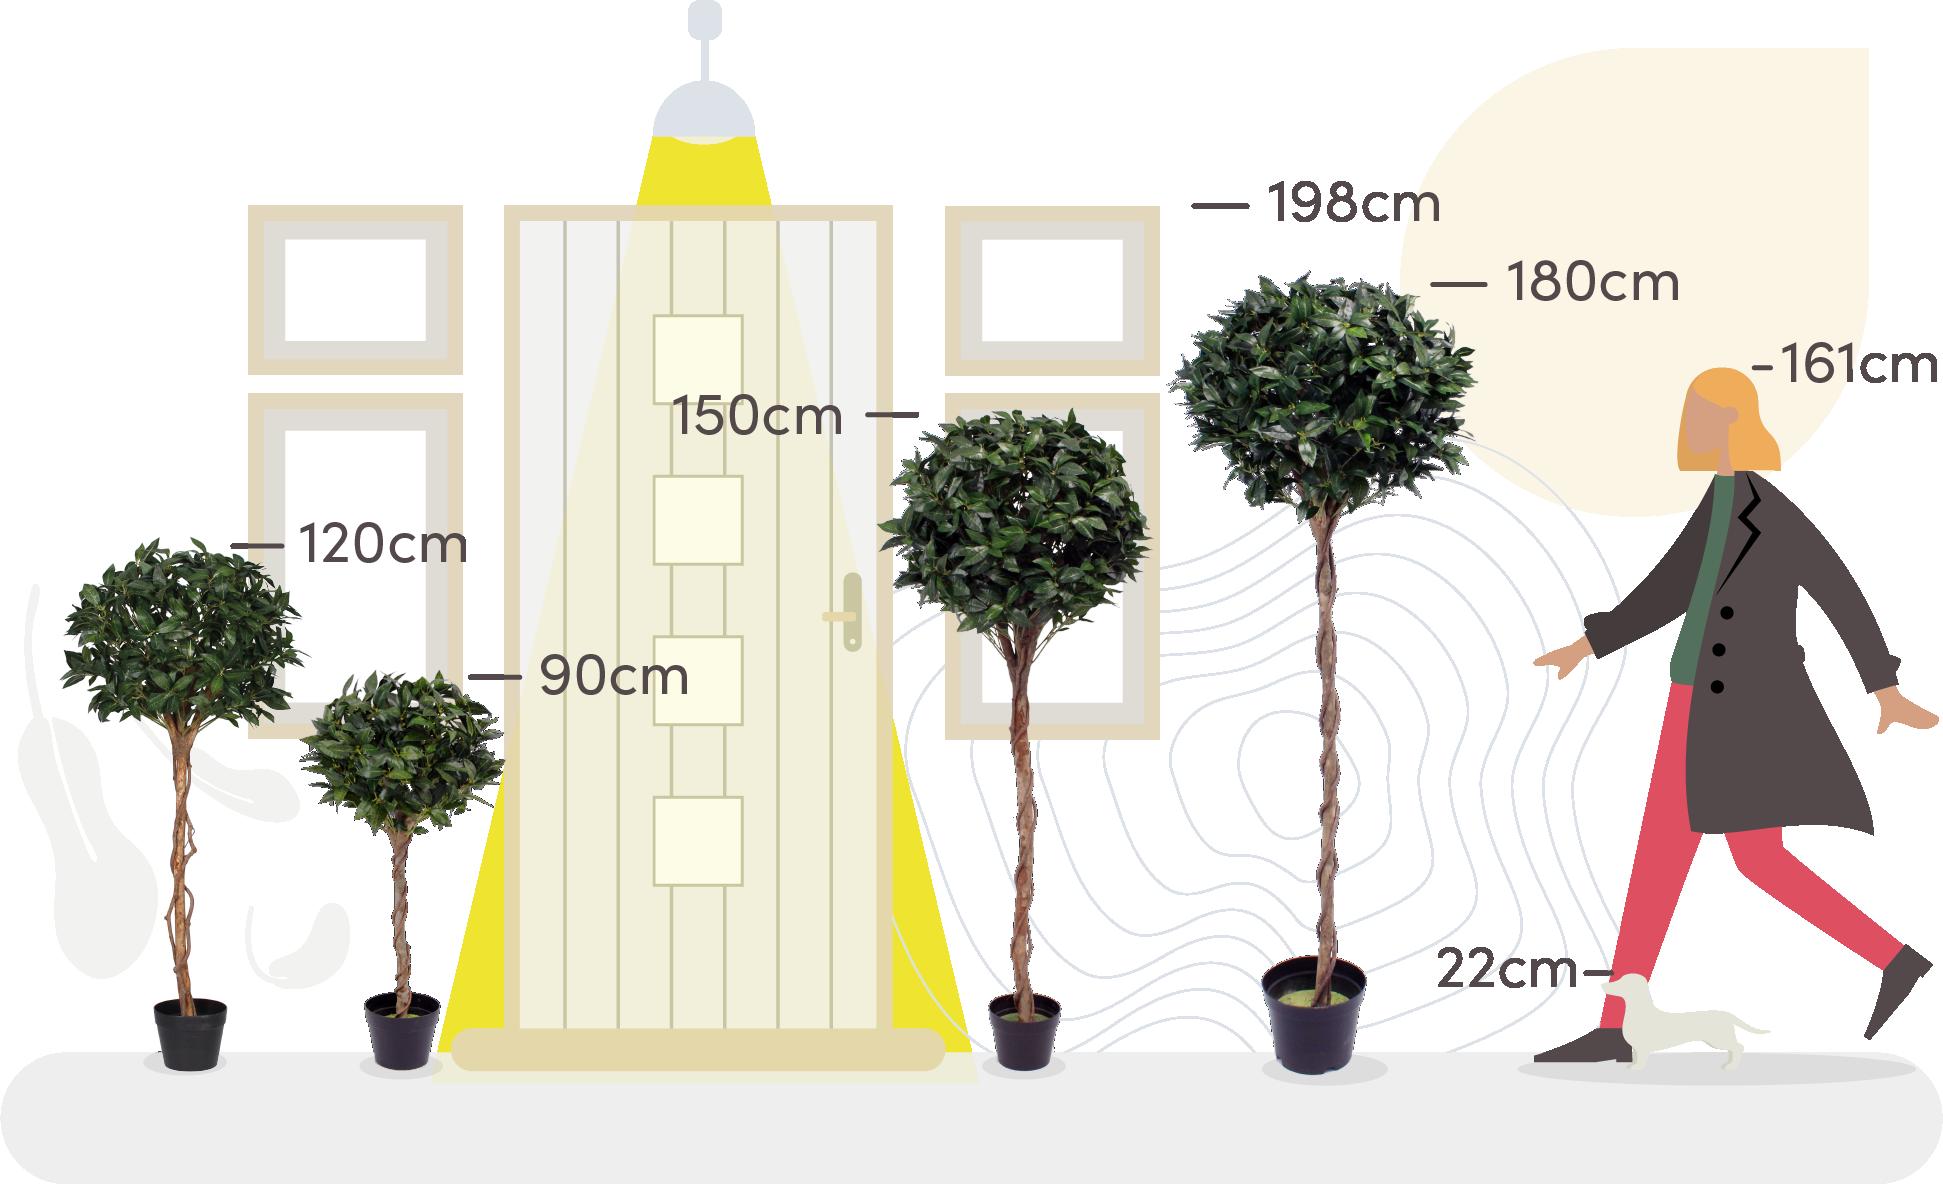 Artificial bay tree size comaparison